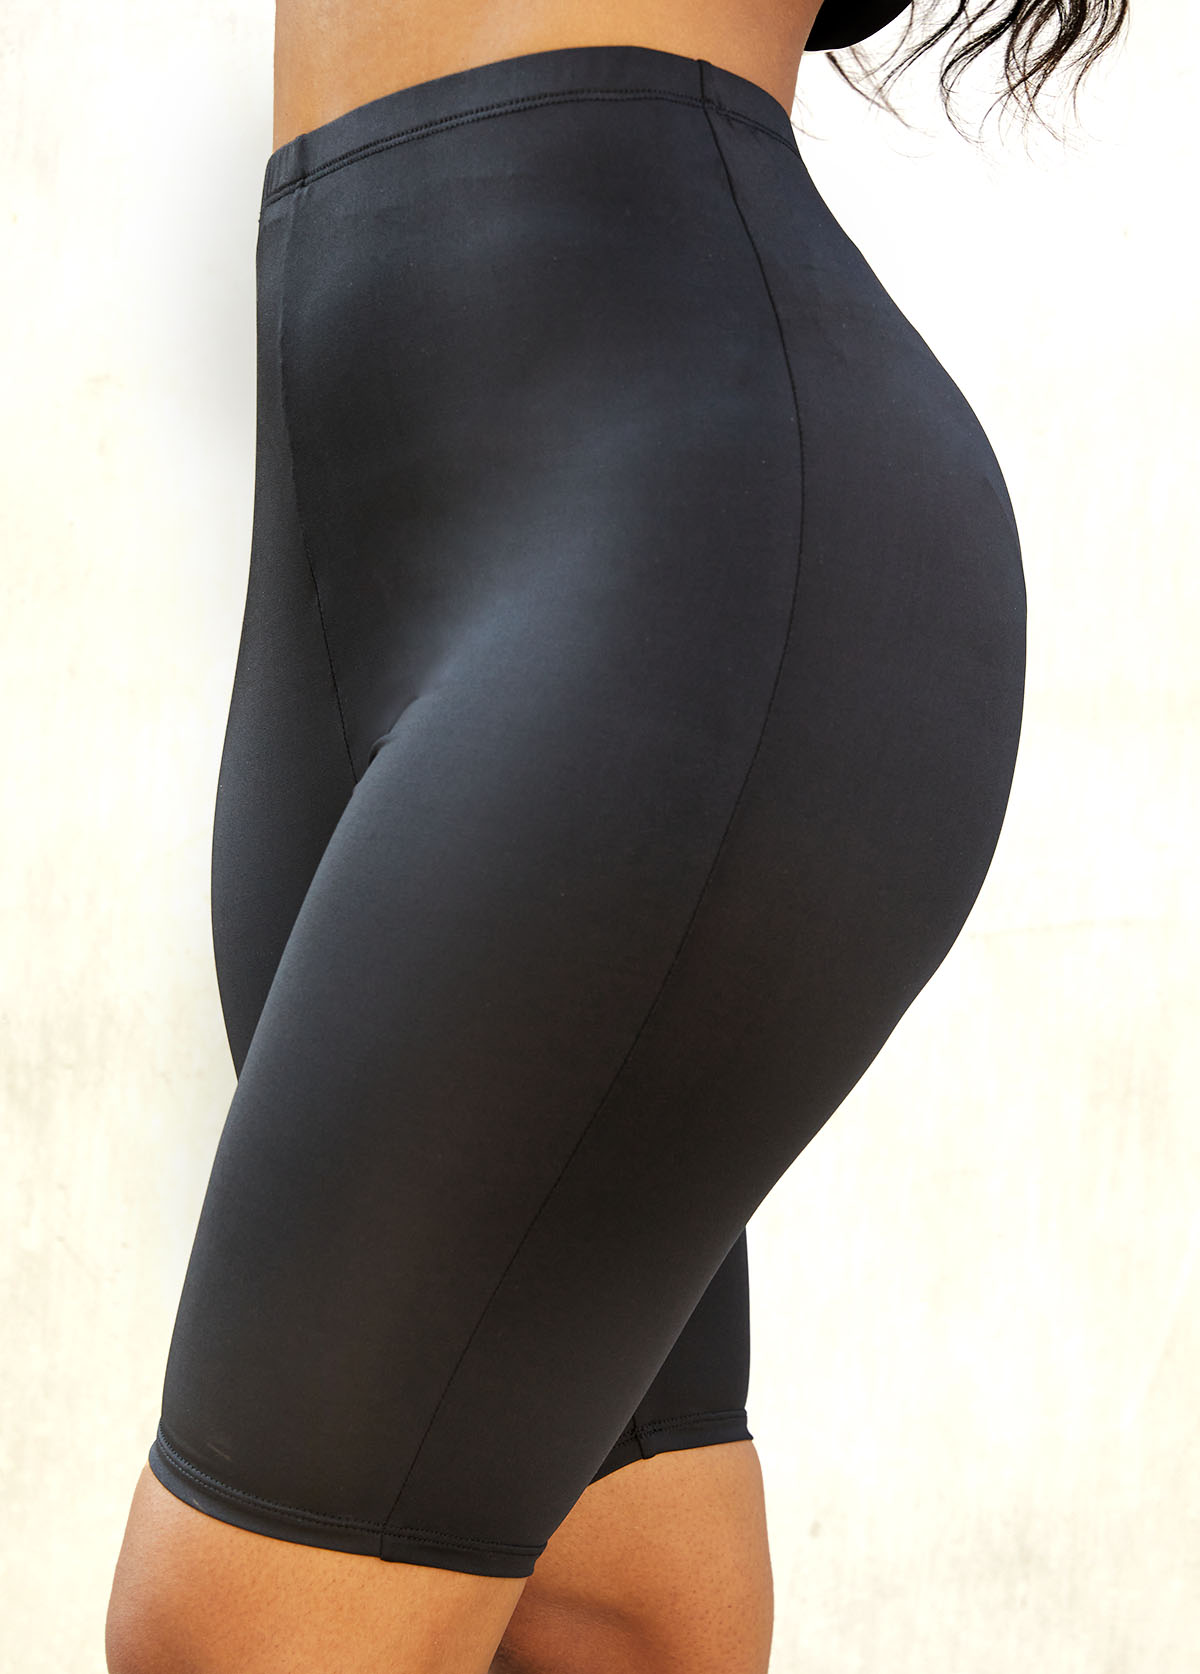 ROTITA Solid High Waistt Skinny Elastic Detail Legging